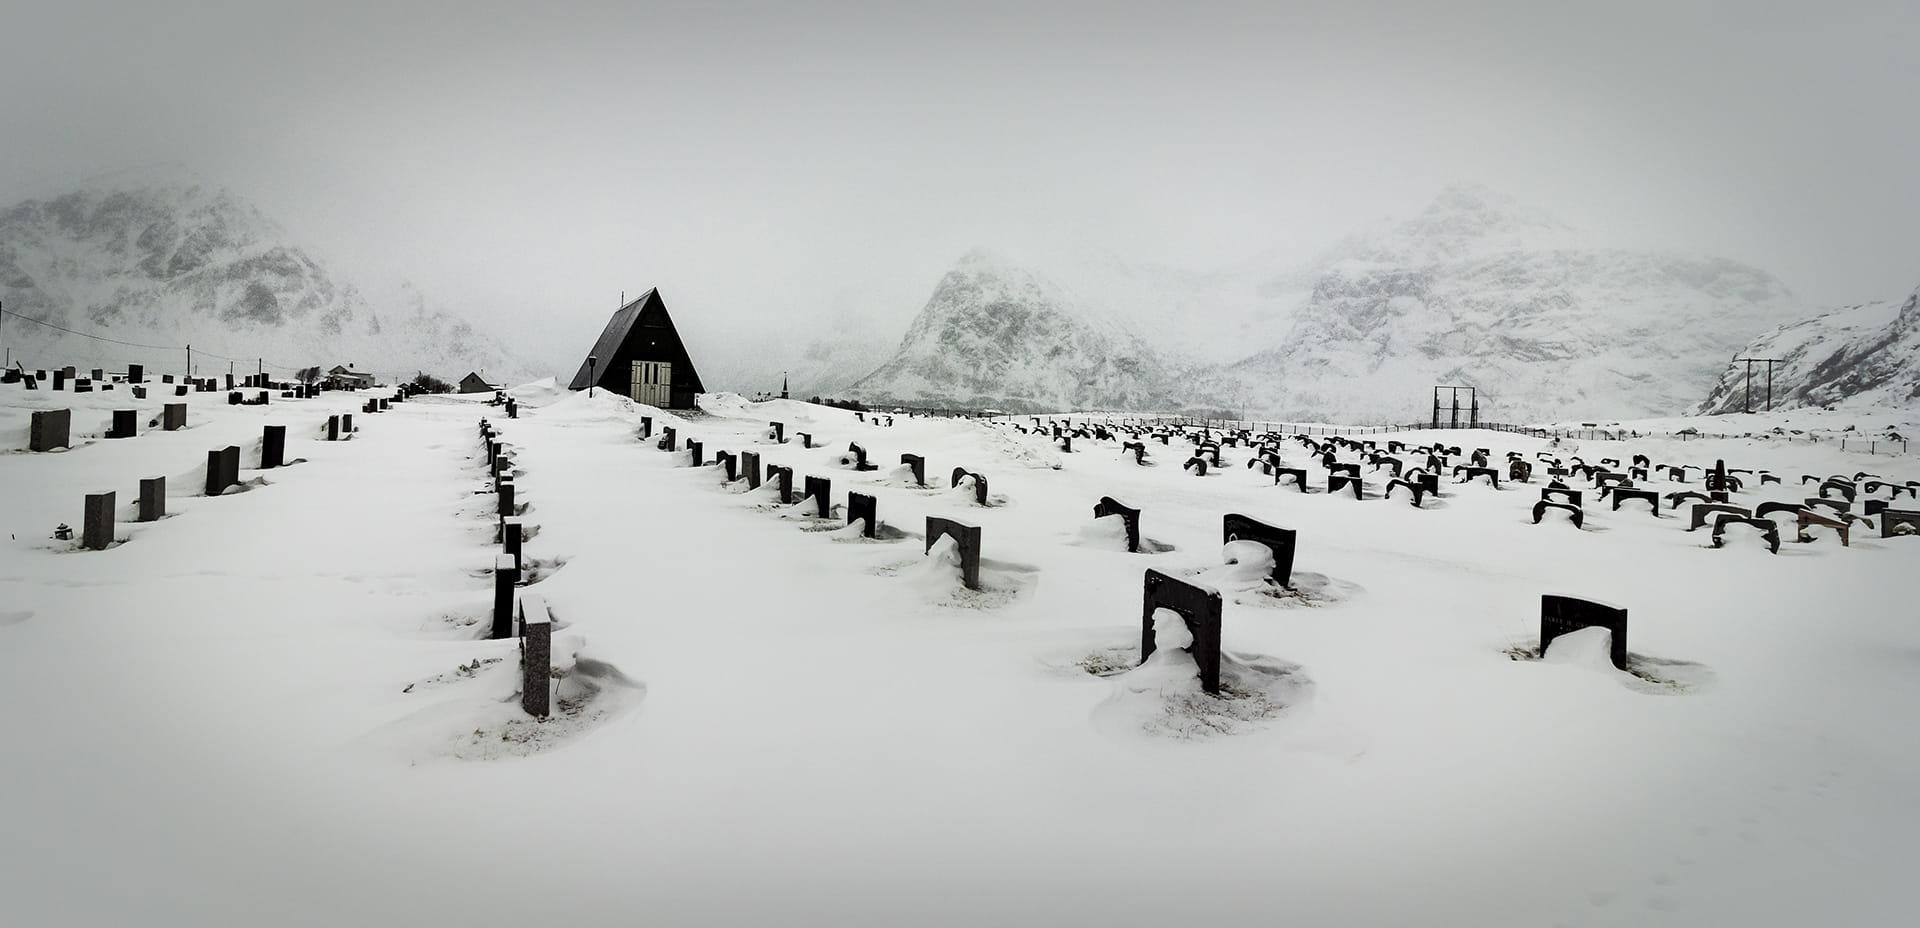 cementerio blanco